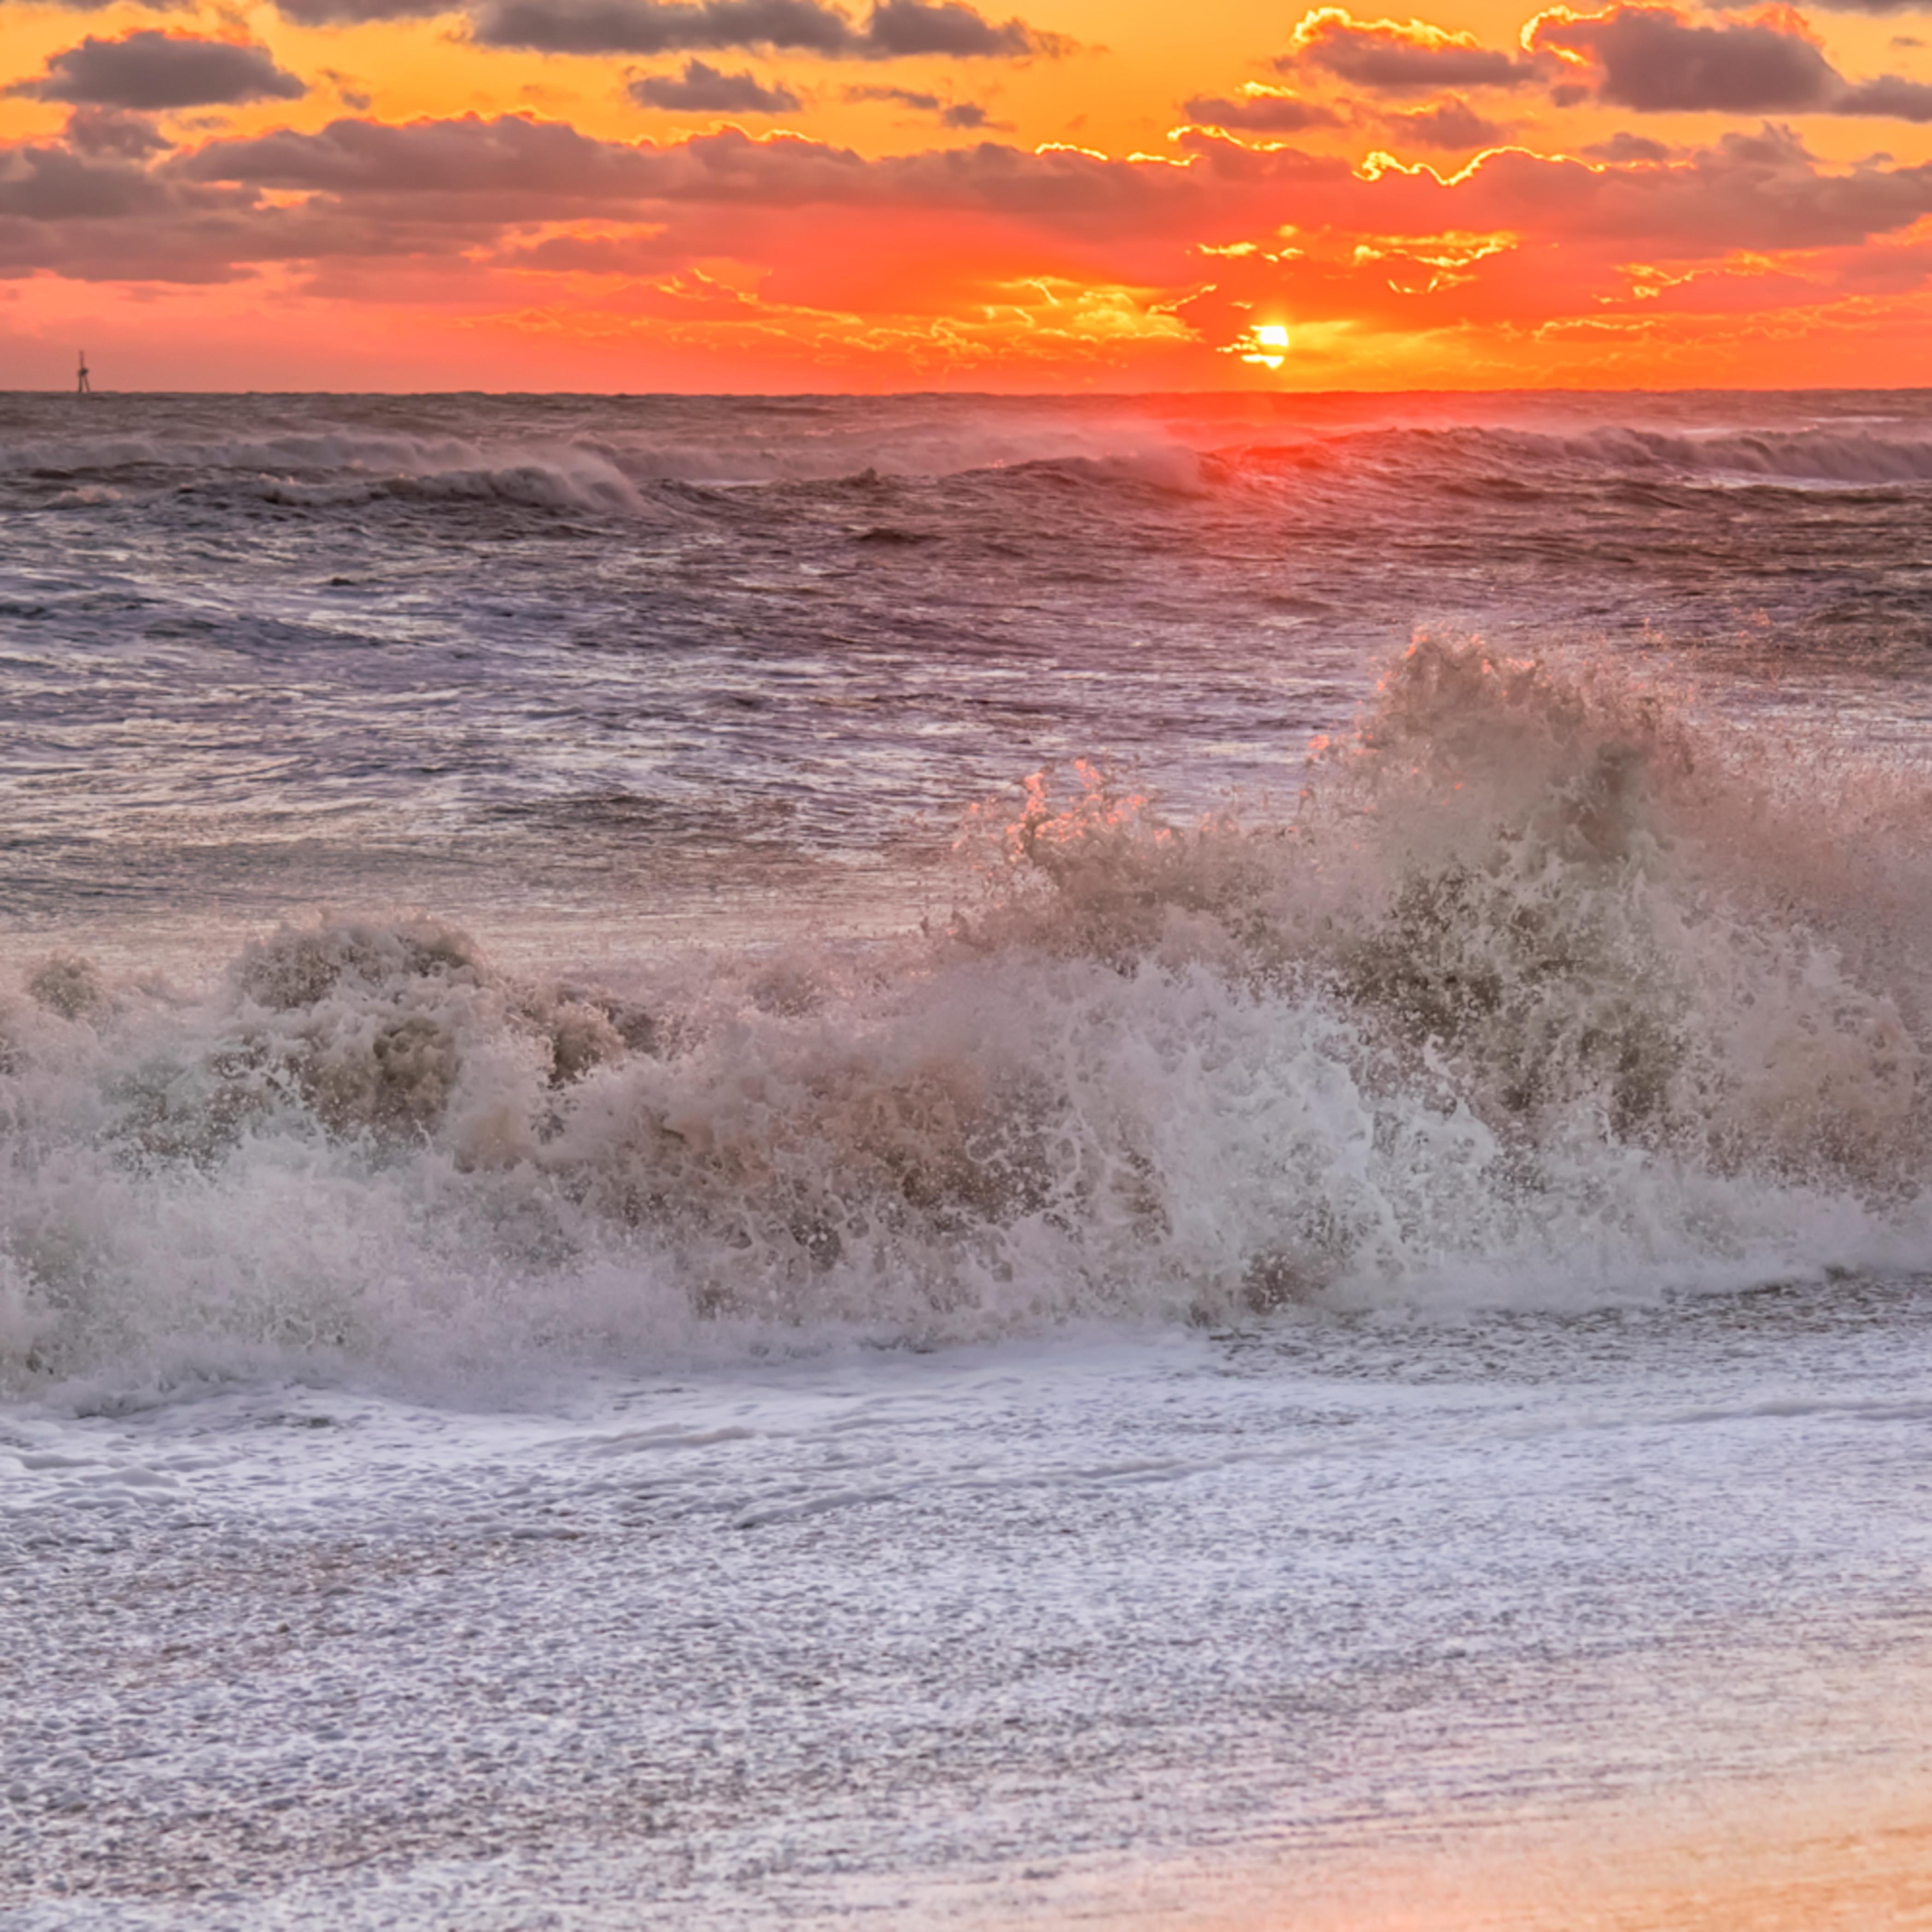 South beach sunset crashing waves uzdl4b